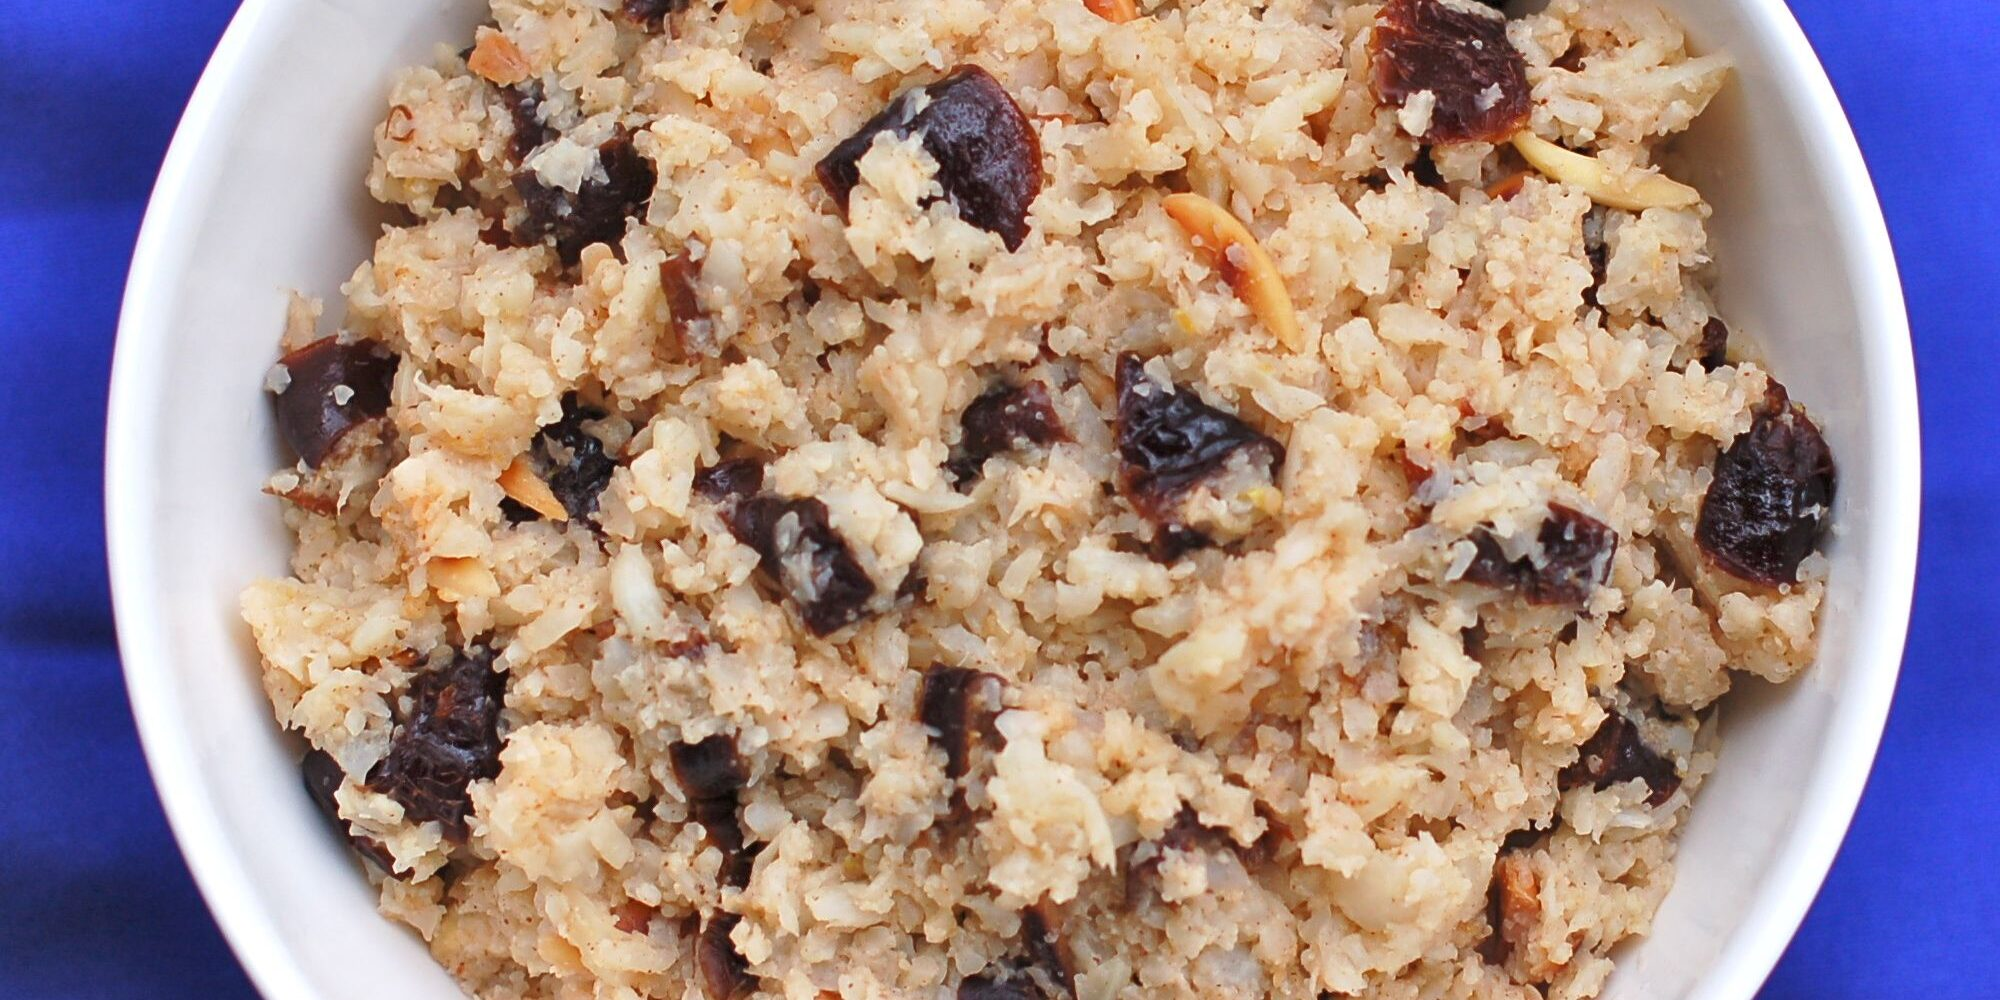 Spiced Prune Cauliflower Rice